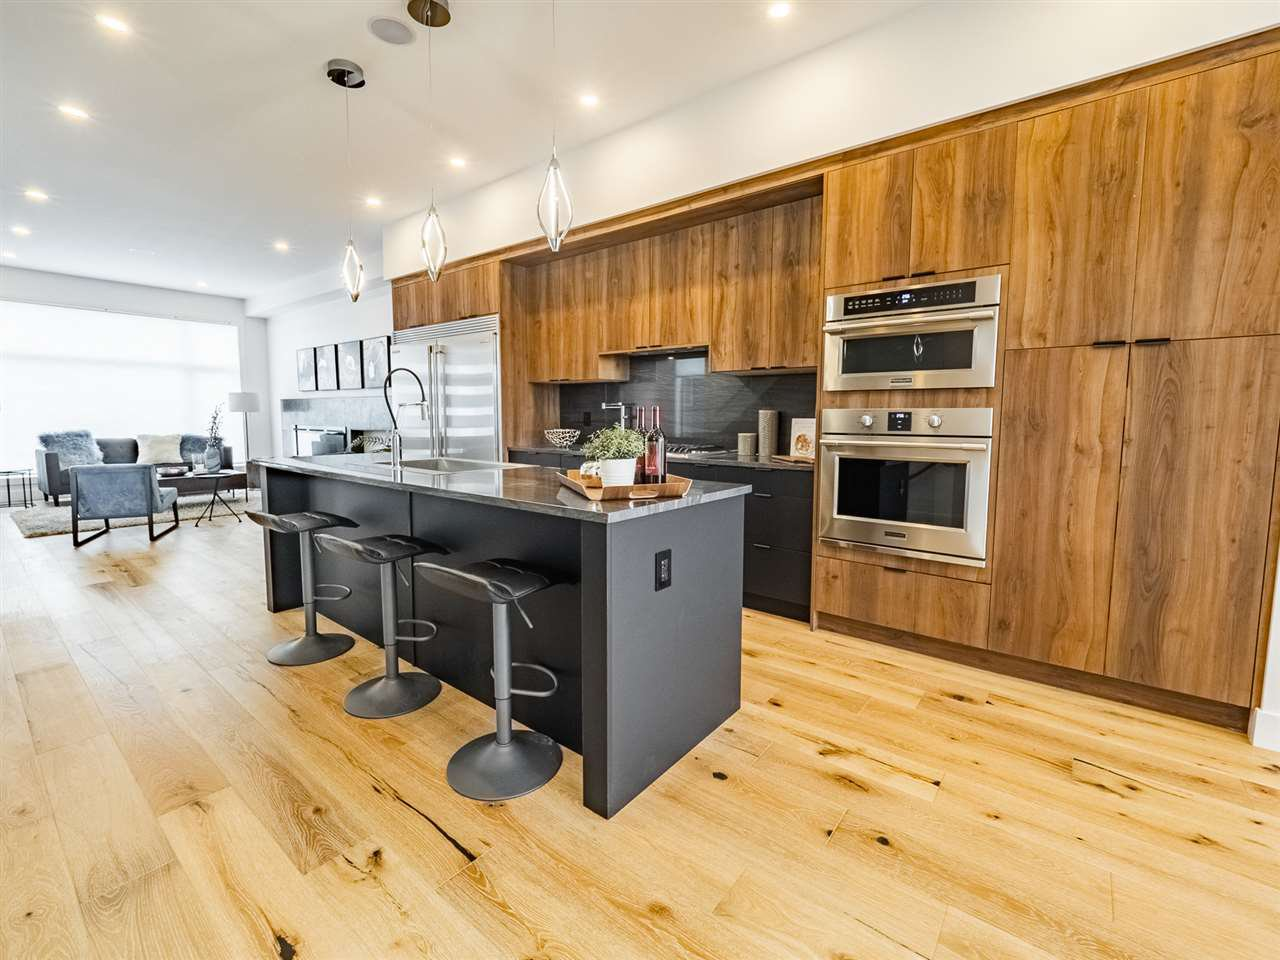 Main Photo: 9640 148 Street in Edmonton: Zone 10 House for sale : MLS®# E4198016